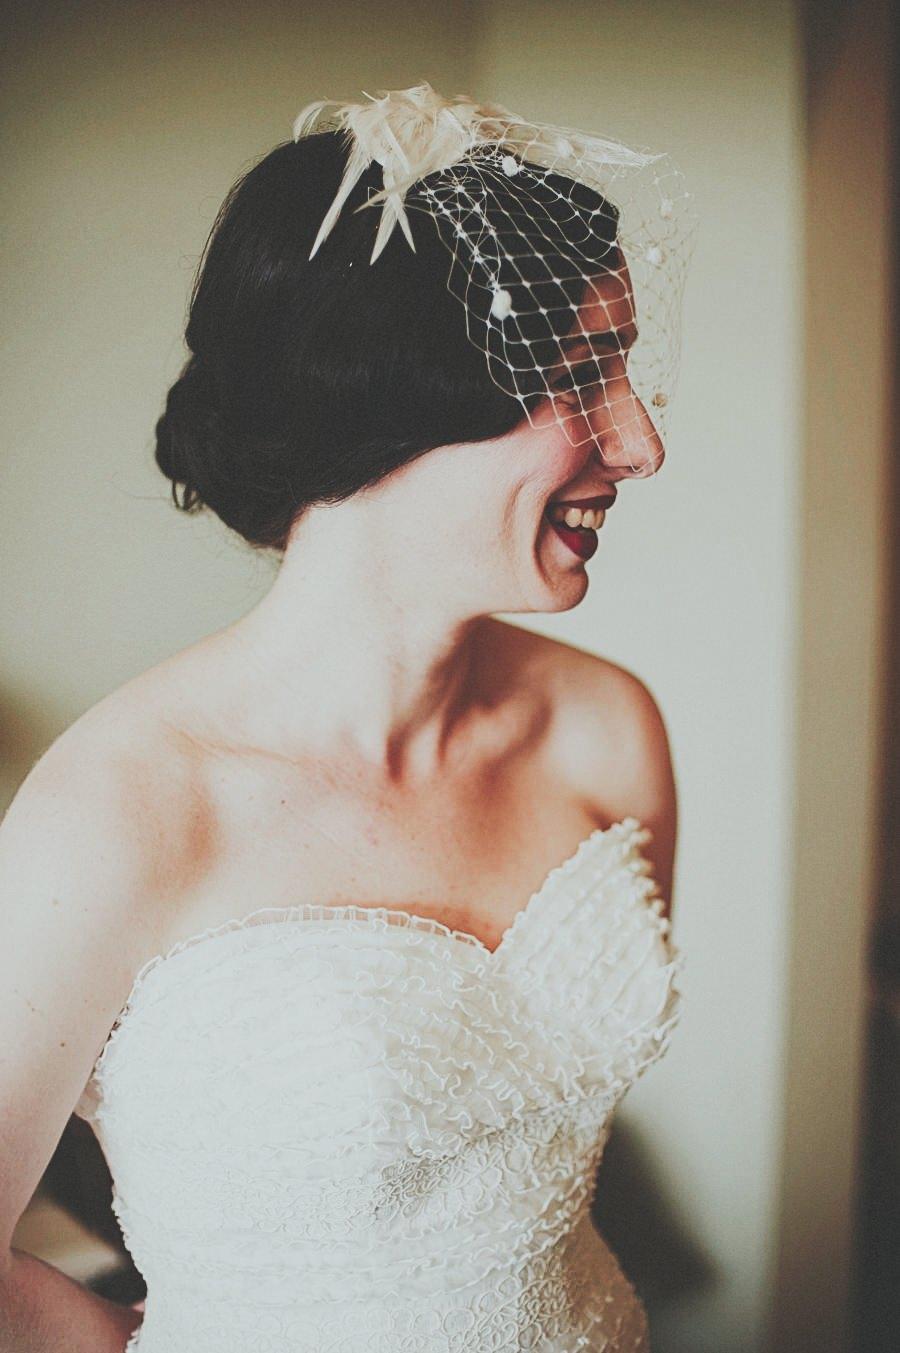 preston-court-wedding-photograph-kent--7.jpg